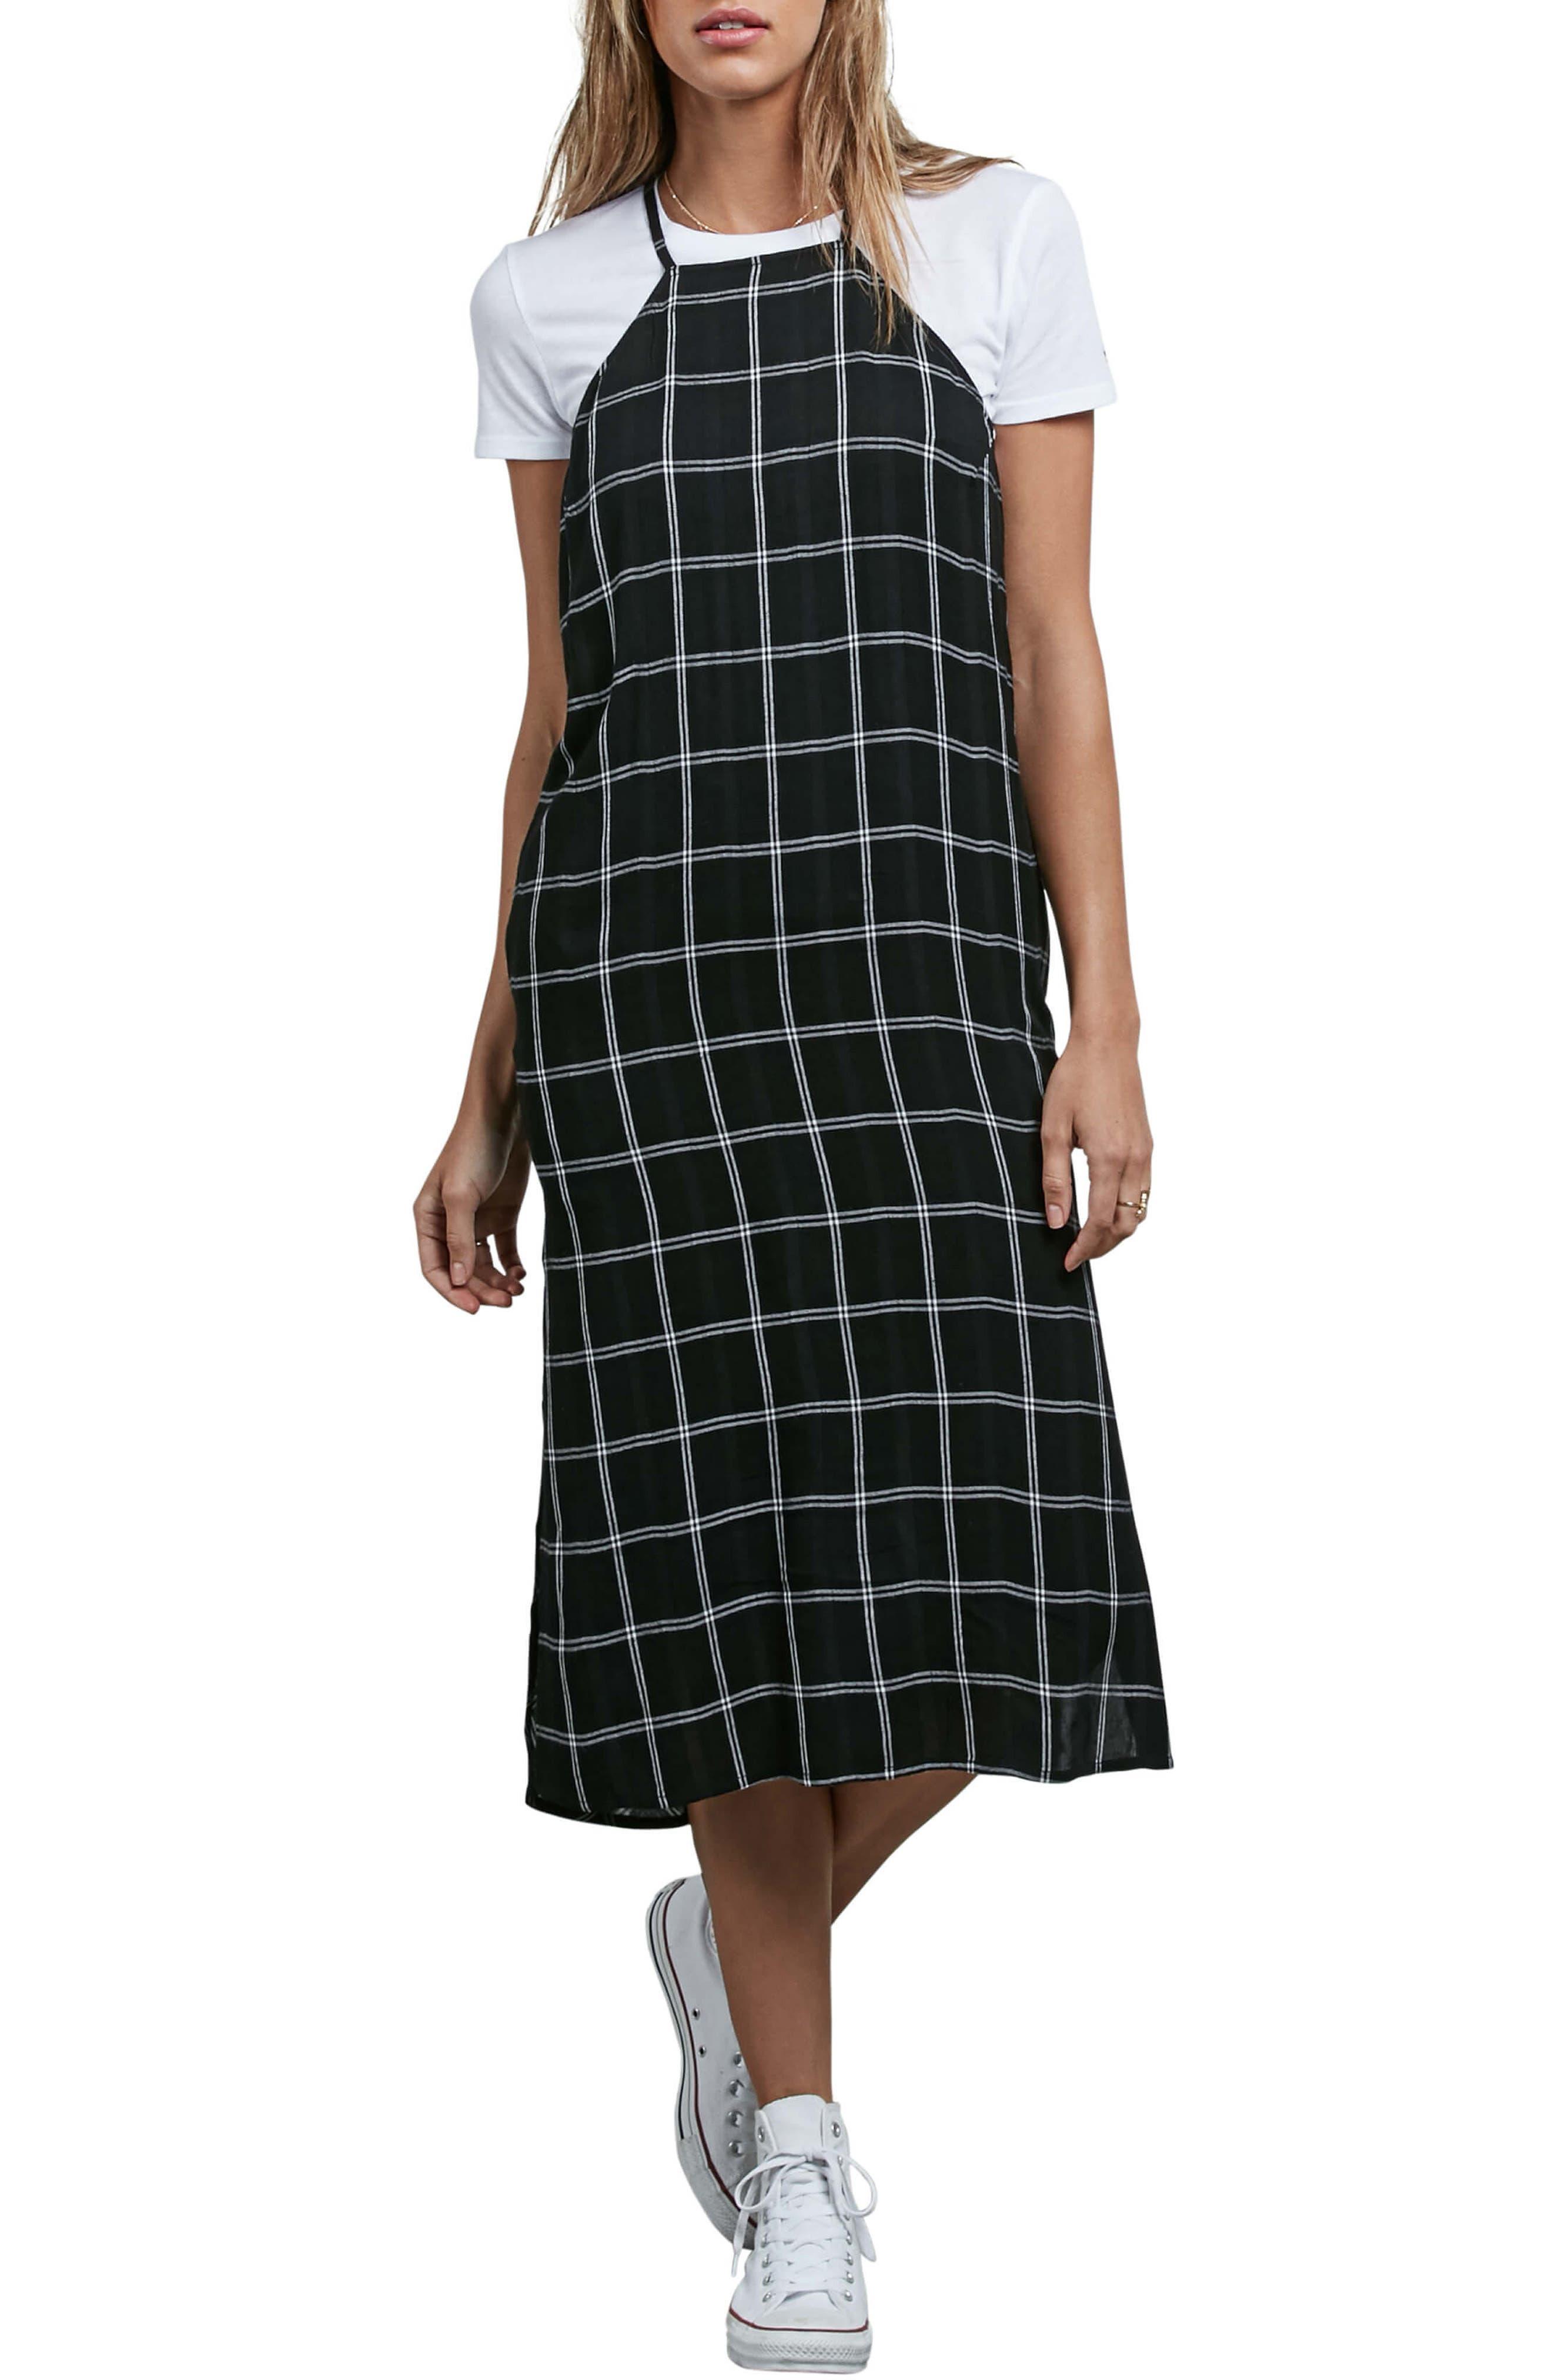 Jumponit Windowpane Print Midi Dress,                         Main,                         color, Black